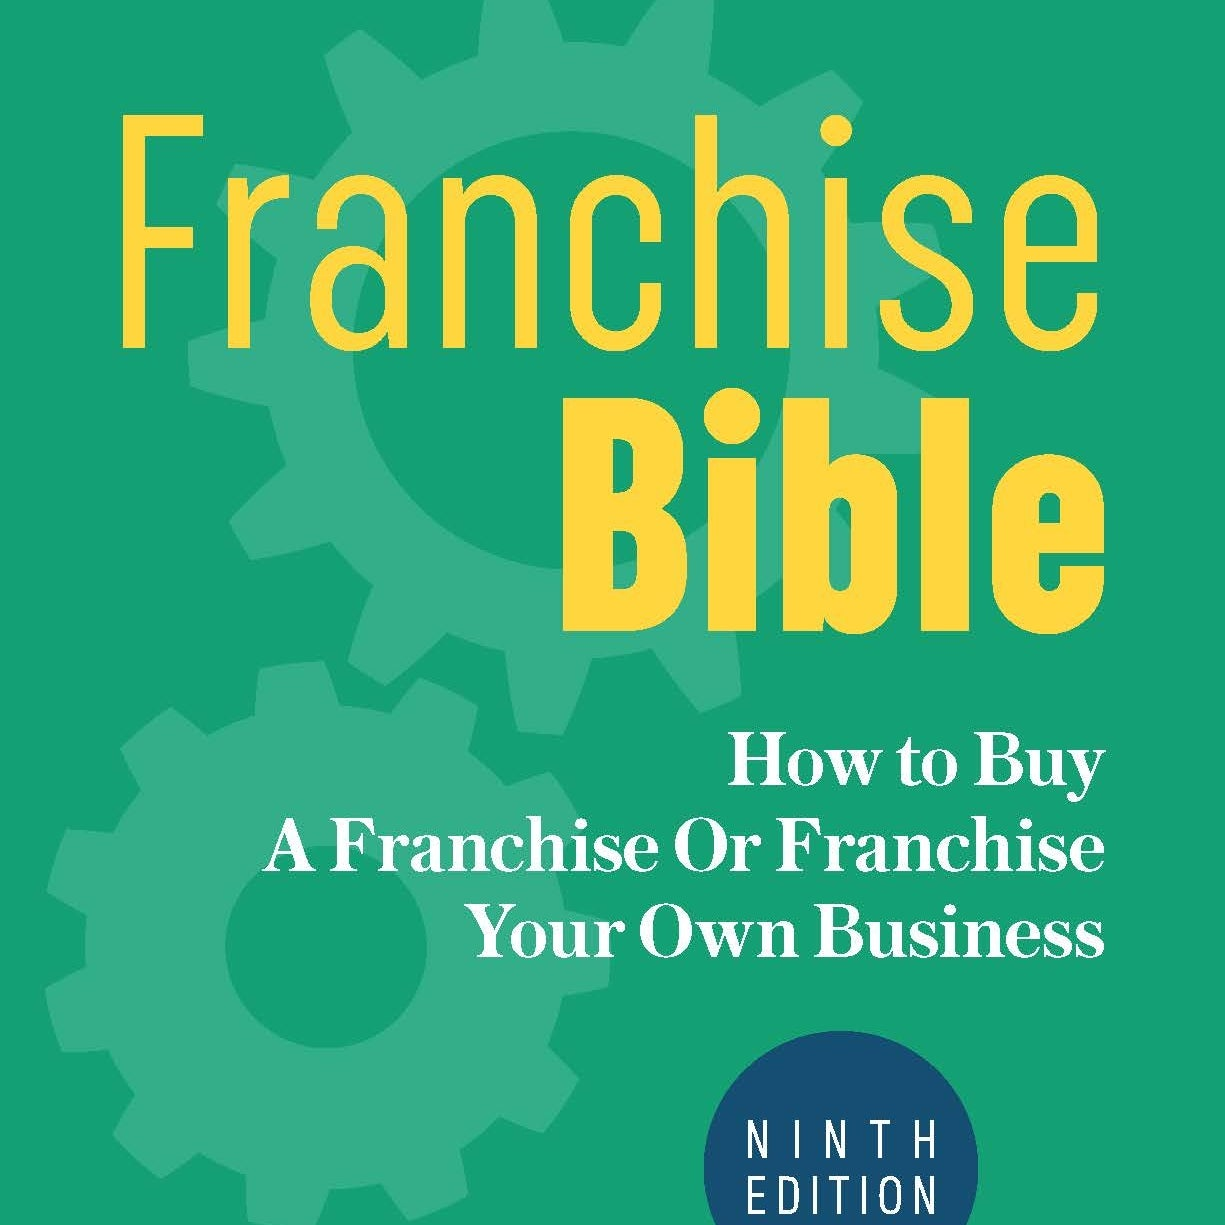 Franchise Bible Ninth Edition